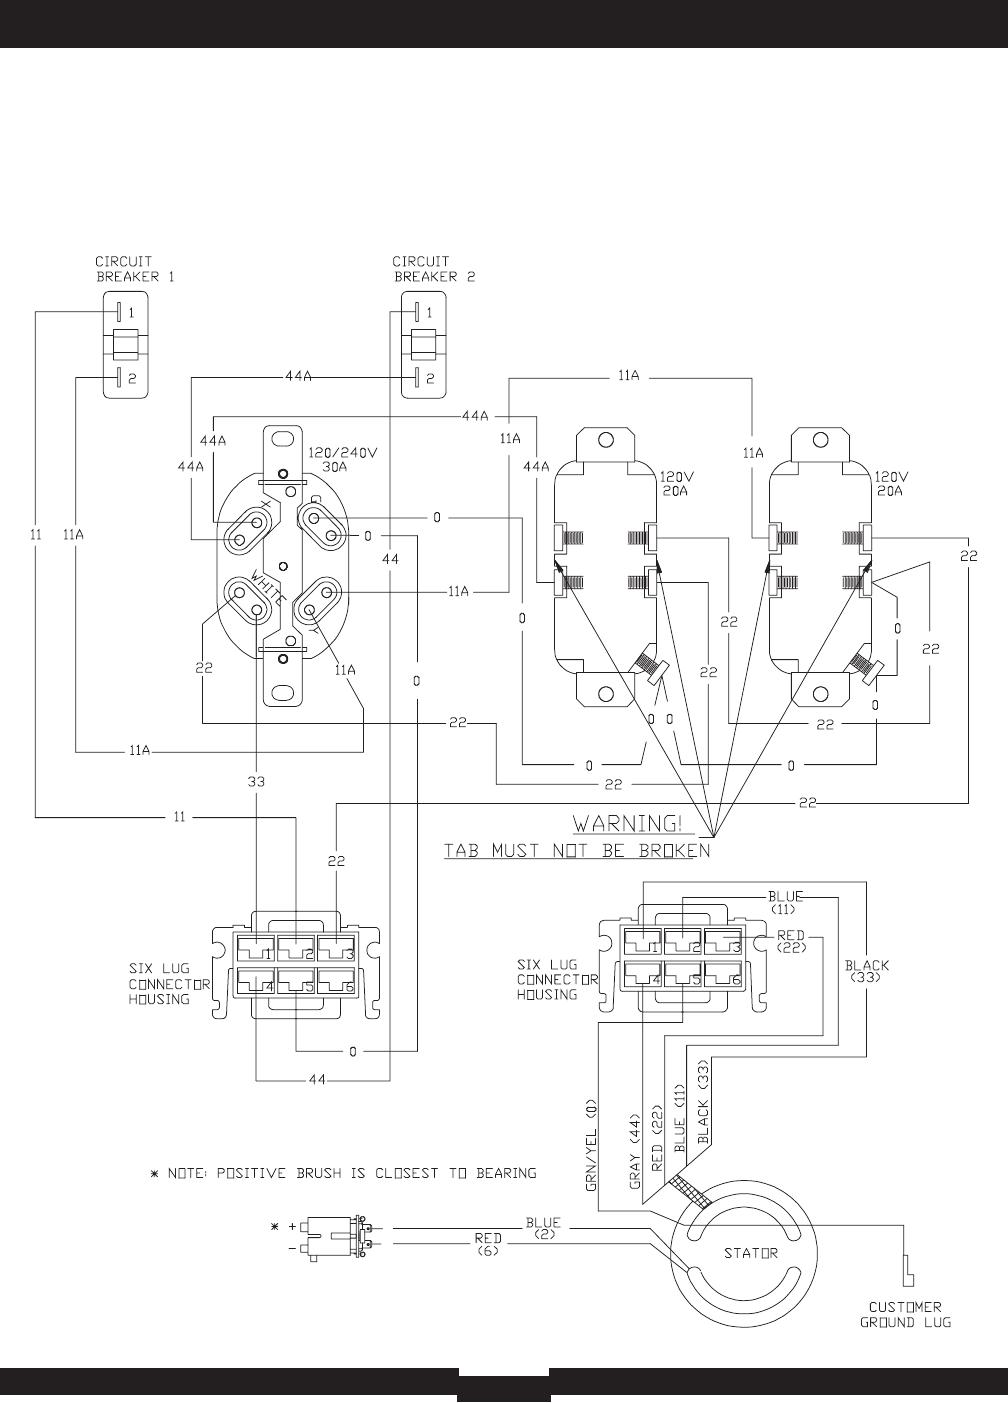 030209 2wds 2 5500 Watt Portable Generator Briggs Stratton 120 240v Wiring Diagram